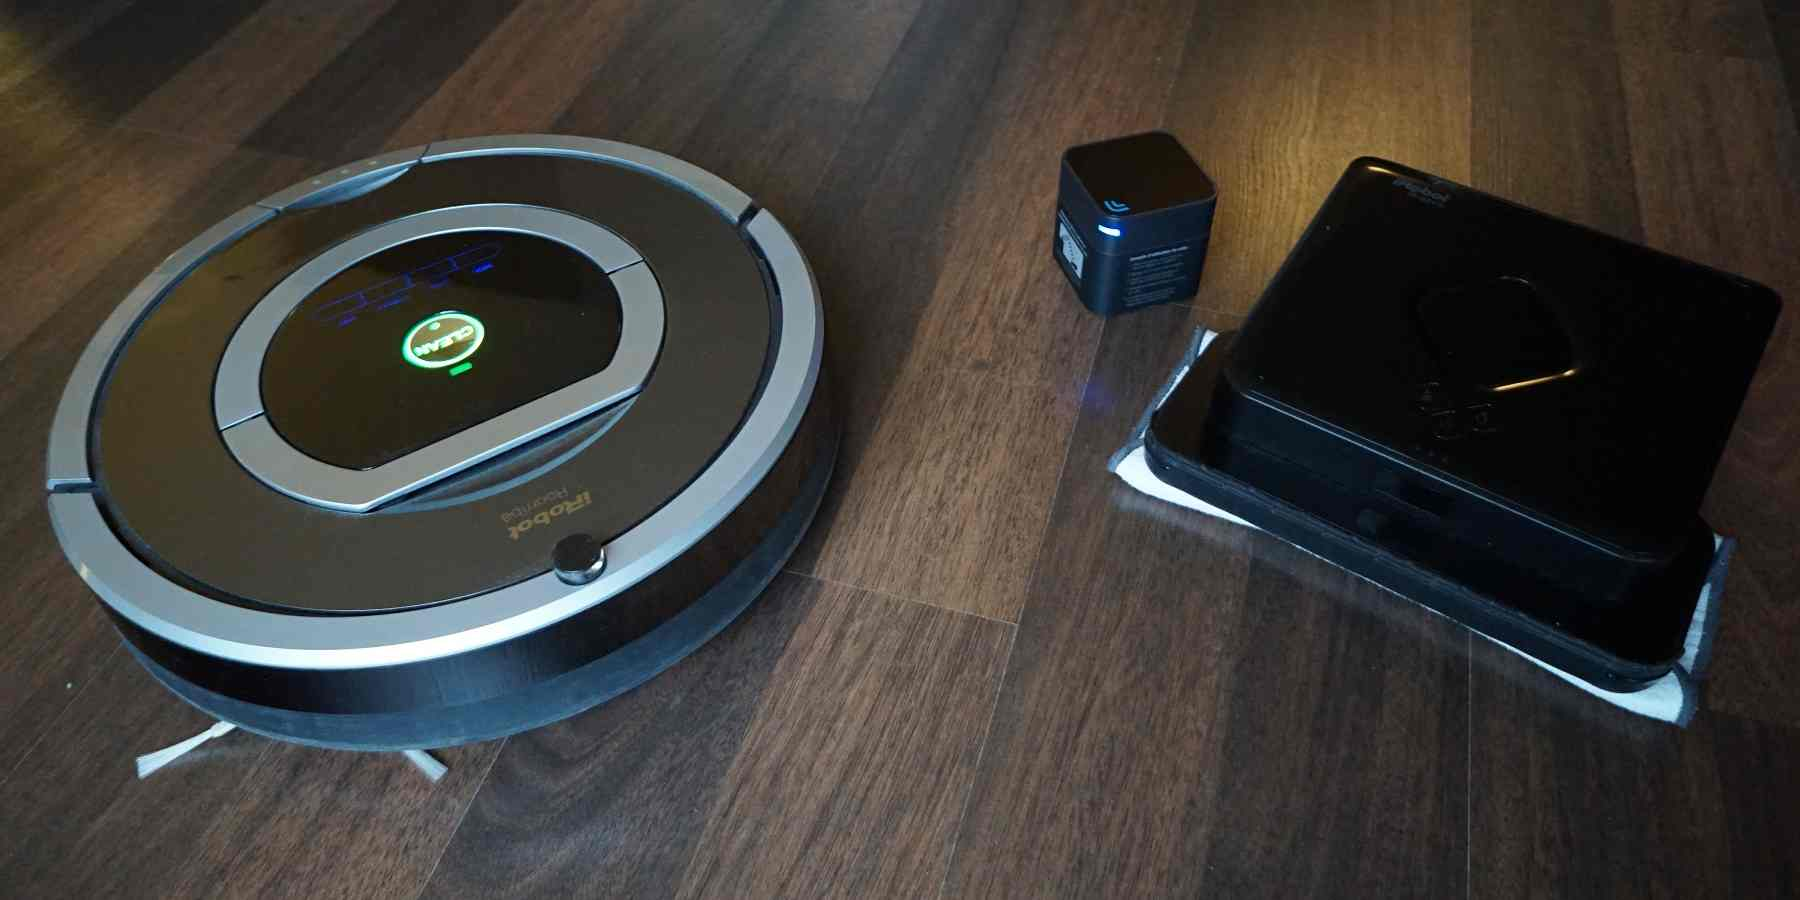 Zwei Roboter für alle Fälle: iRobot Roomba 780 (links) und iRobot Braava 380 mit Navigation Cube (rechts)